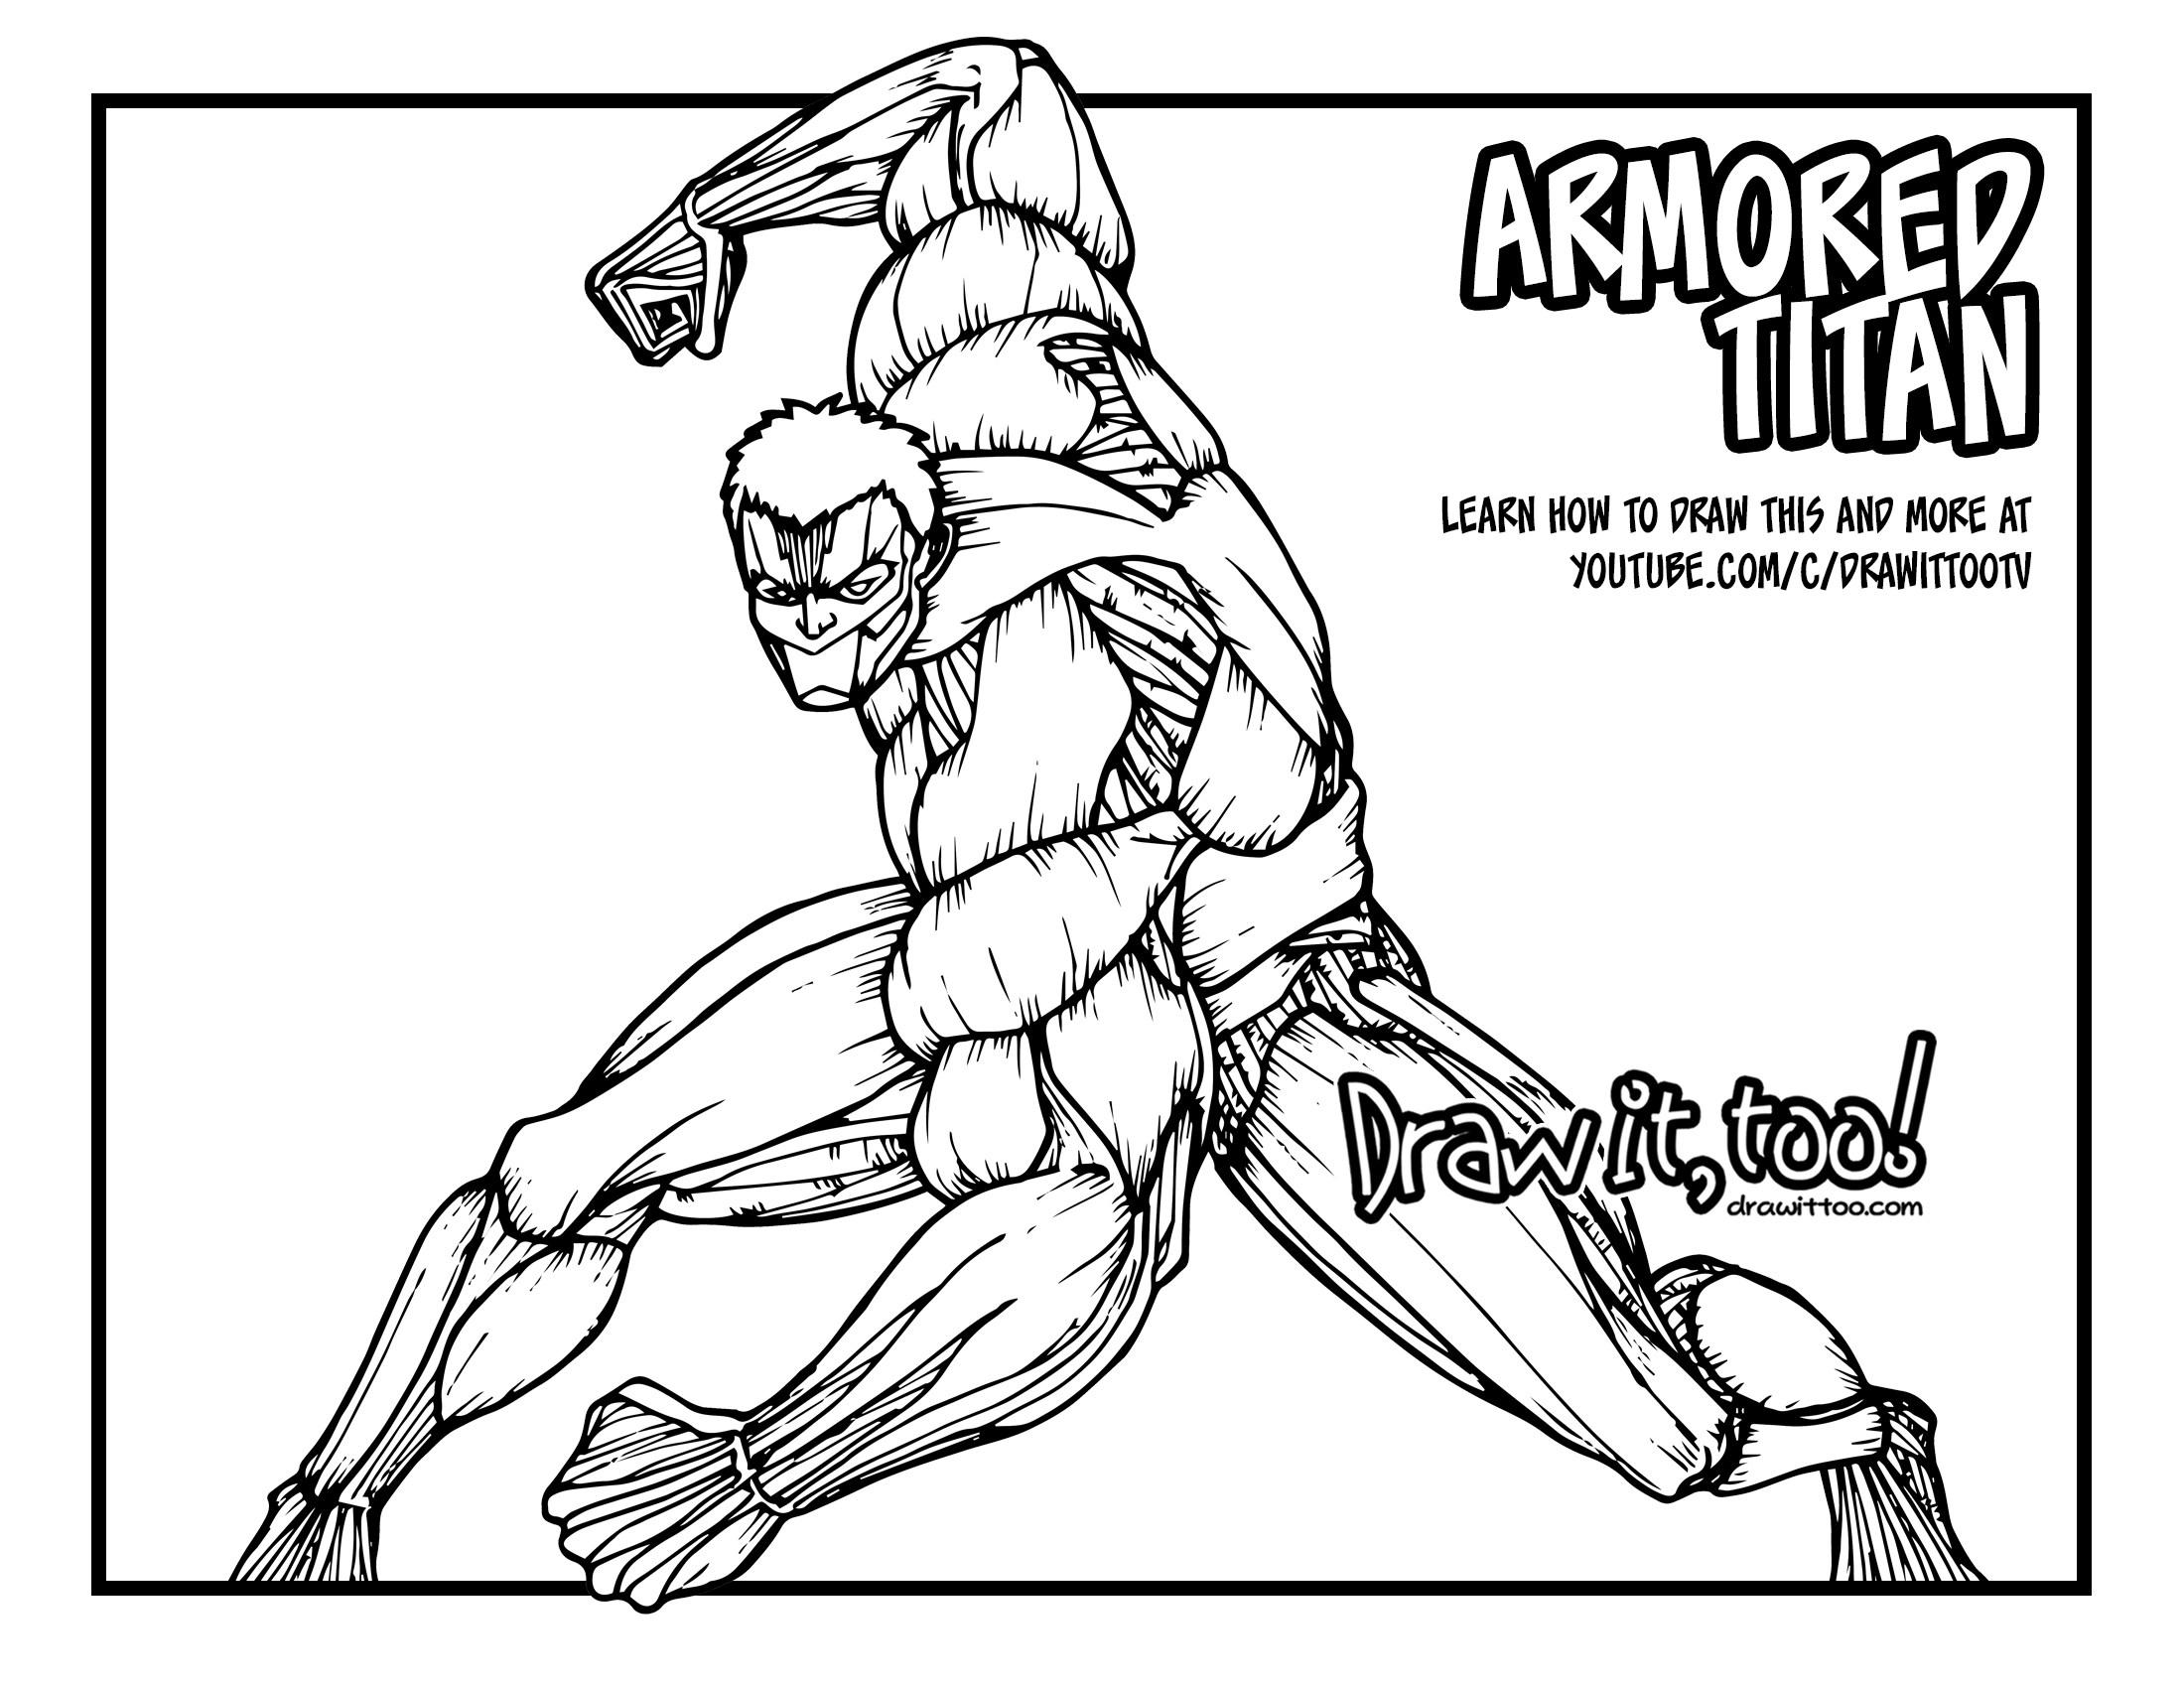 2200x1700 Armored Titan (Attack On Titan) Tutorial Draw It, Too!